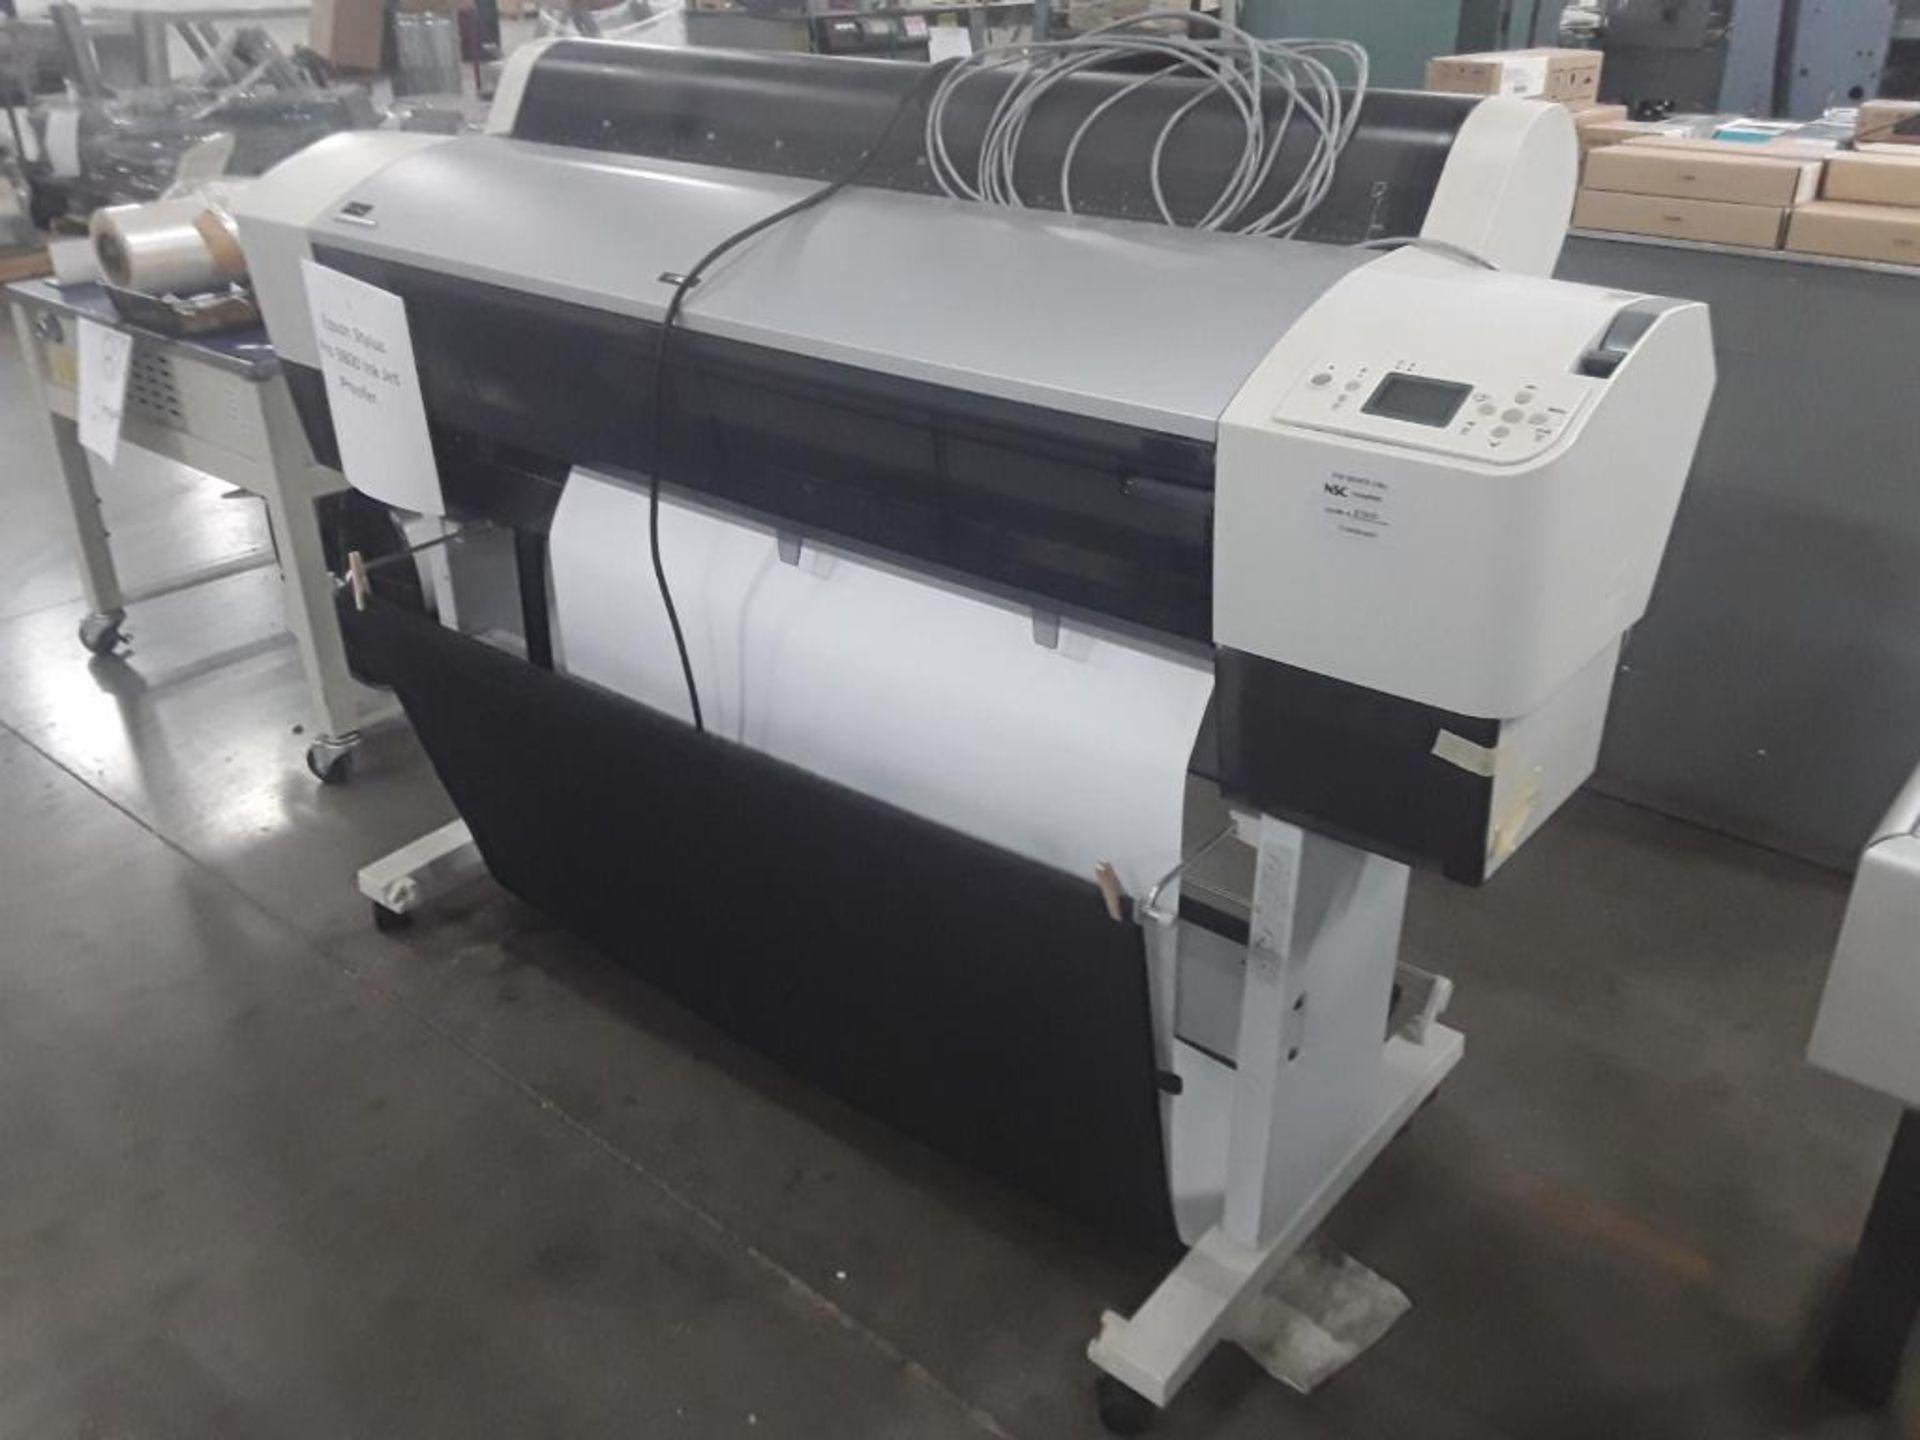 Lot 3 - Epson Stylus Pro 9800